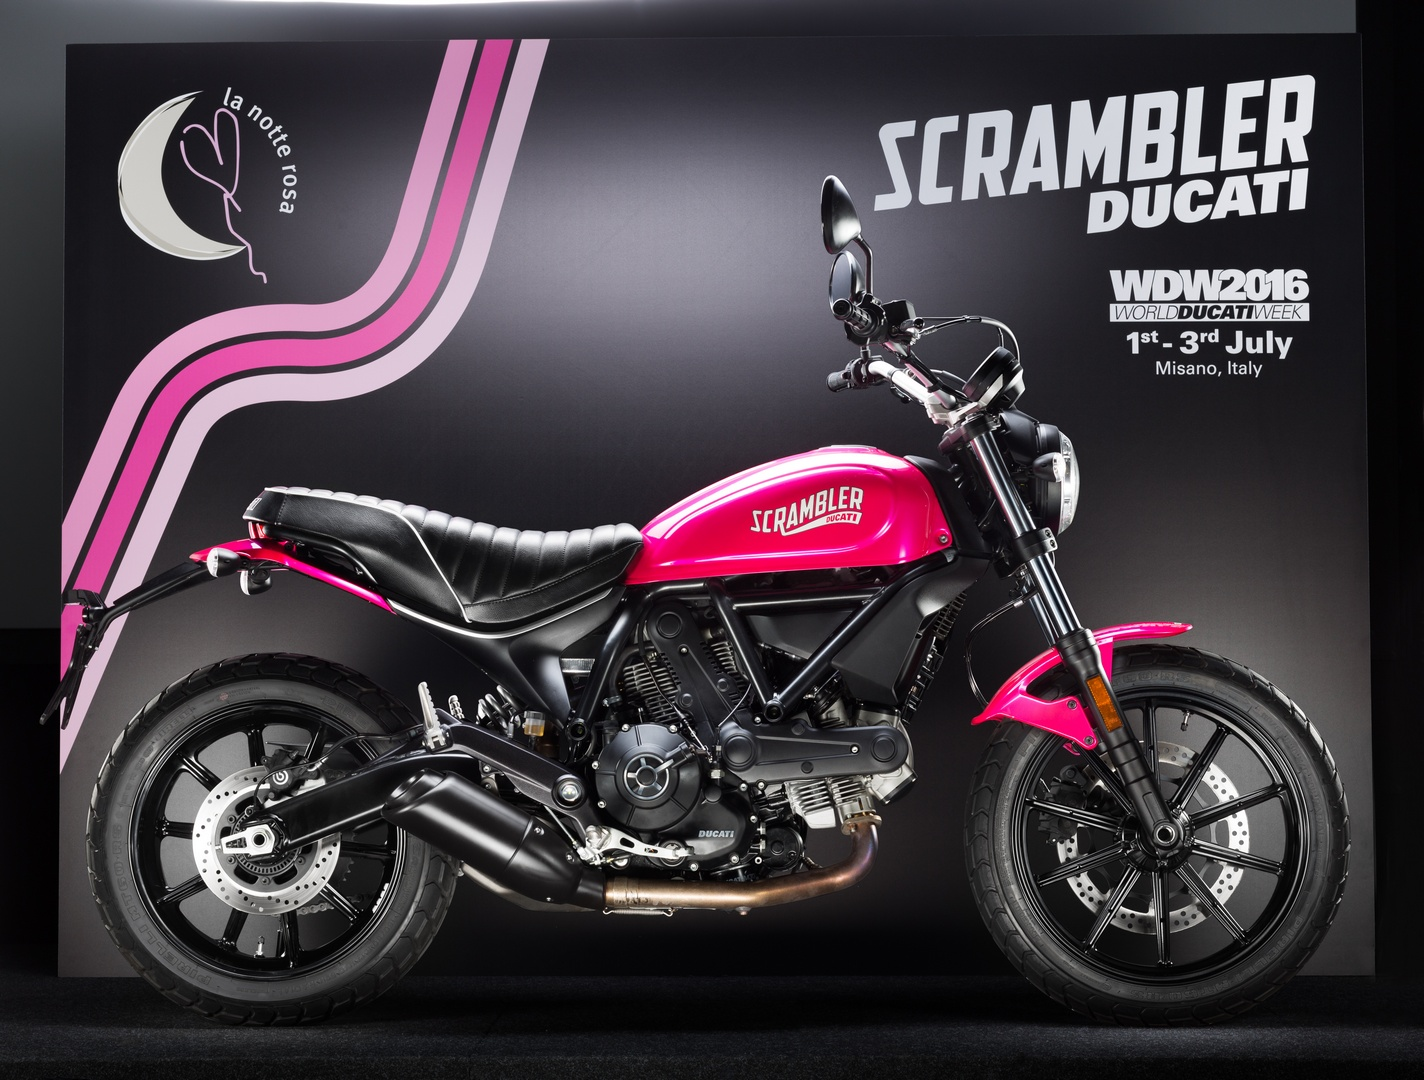 Ducati Scrambler Shocking Is A Pink Bike That Ladies Might Just Love